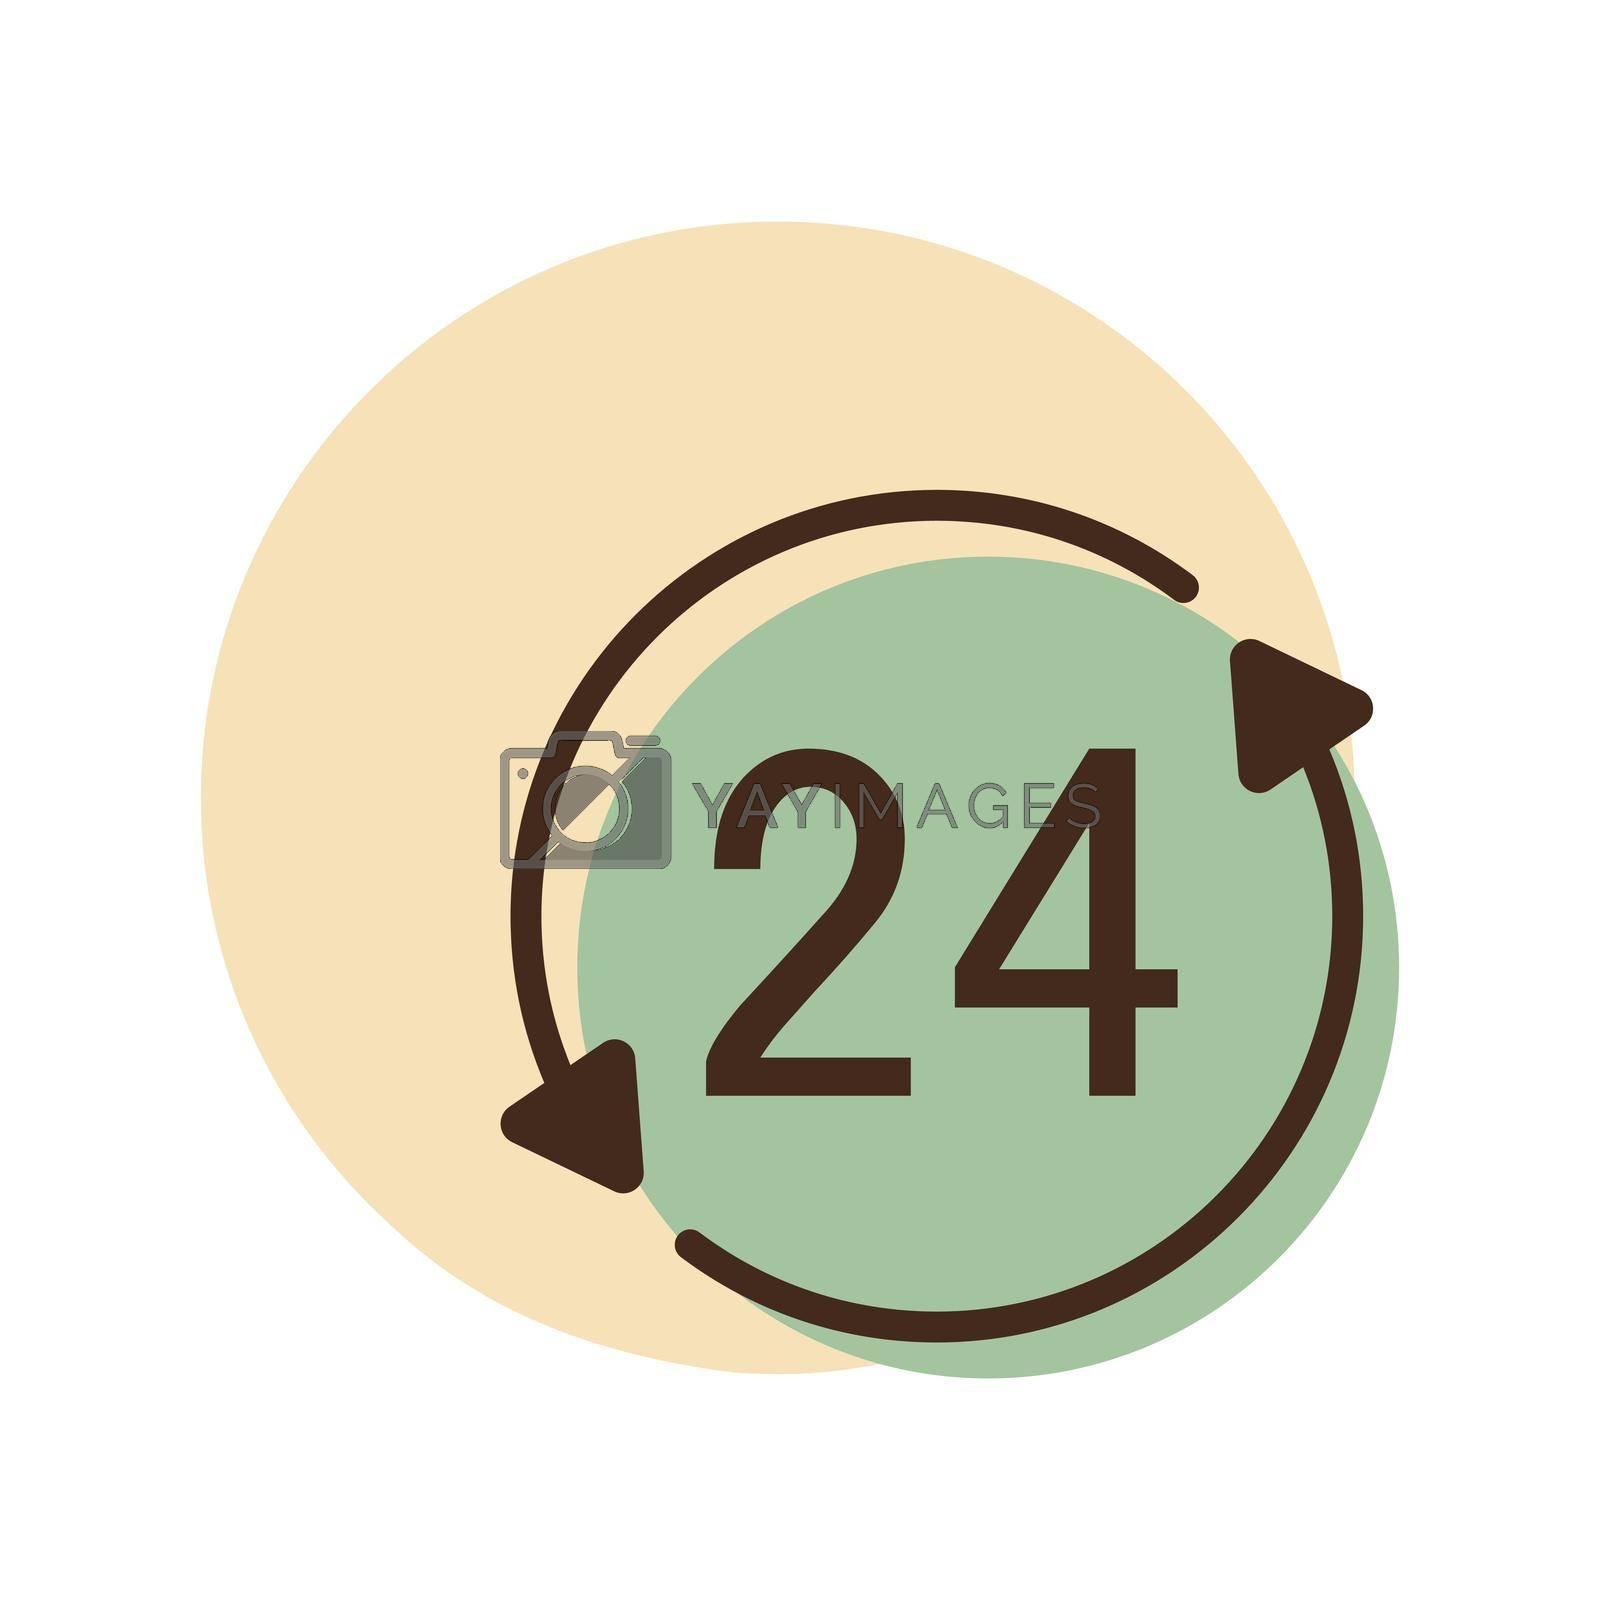 Service twenty four hours vector icon. E-commerce sign. Graph symbol for your web site design, logo, app, UI